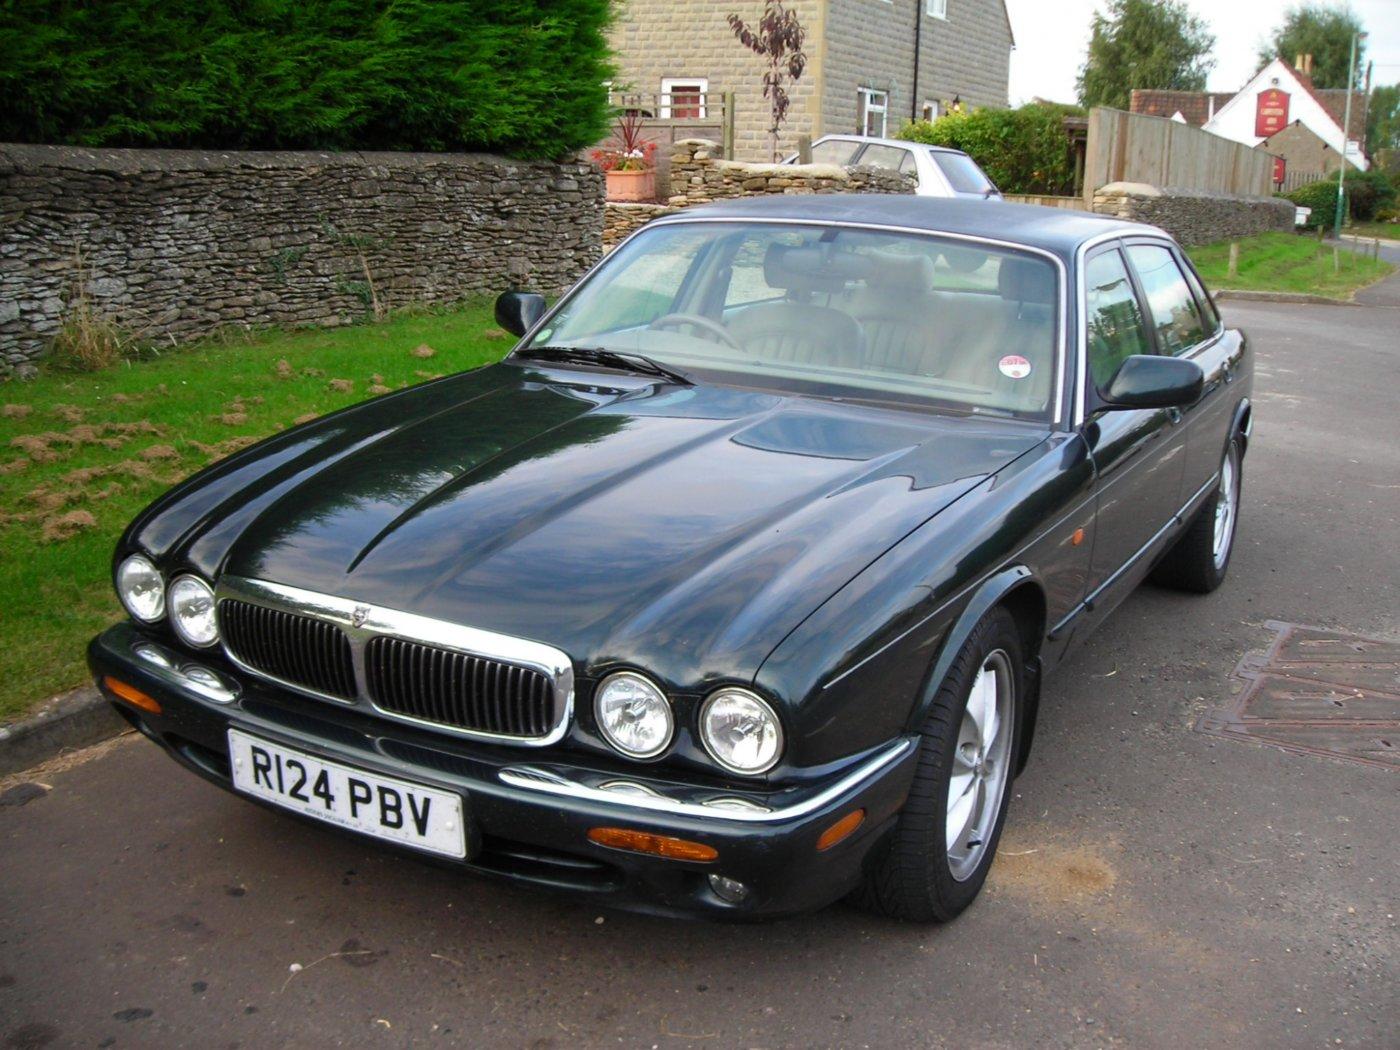 X308 (XJ8) Saloons | Jaguar Enthusiasts' Club